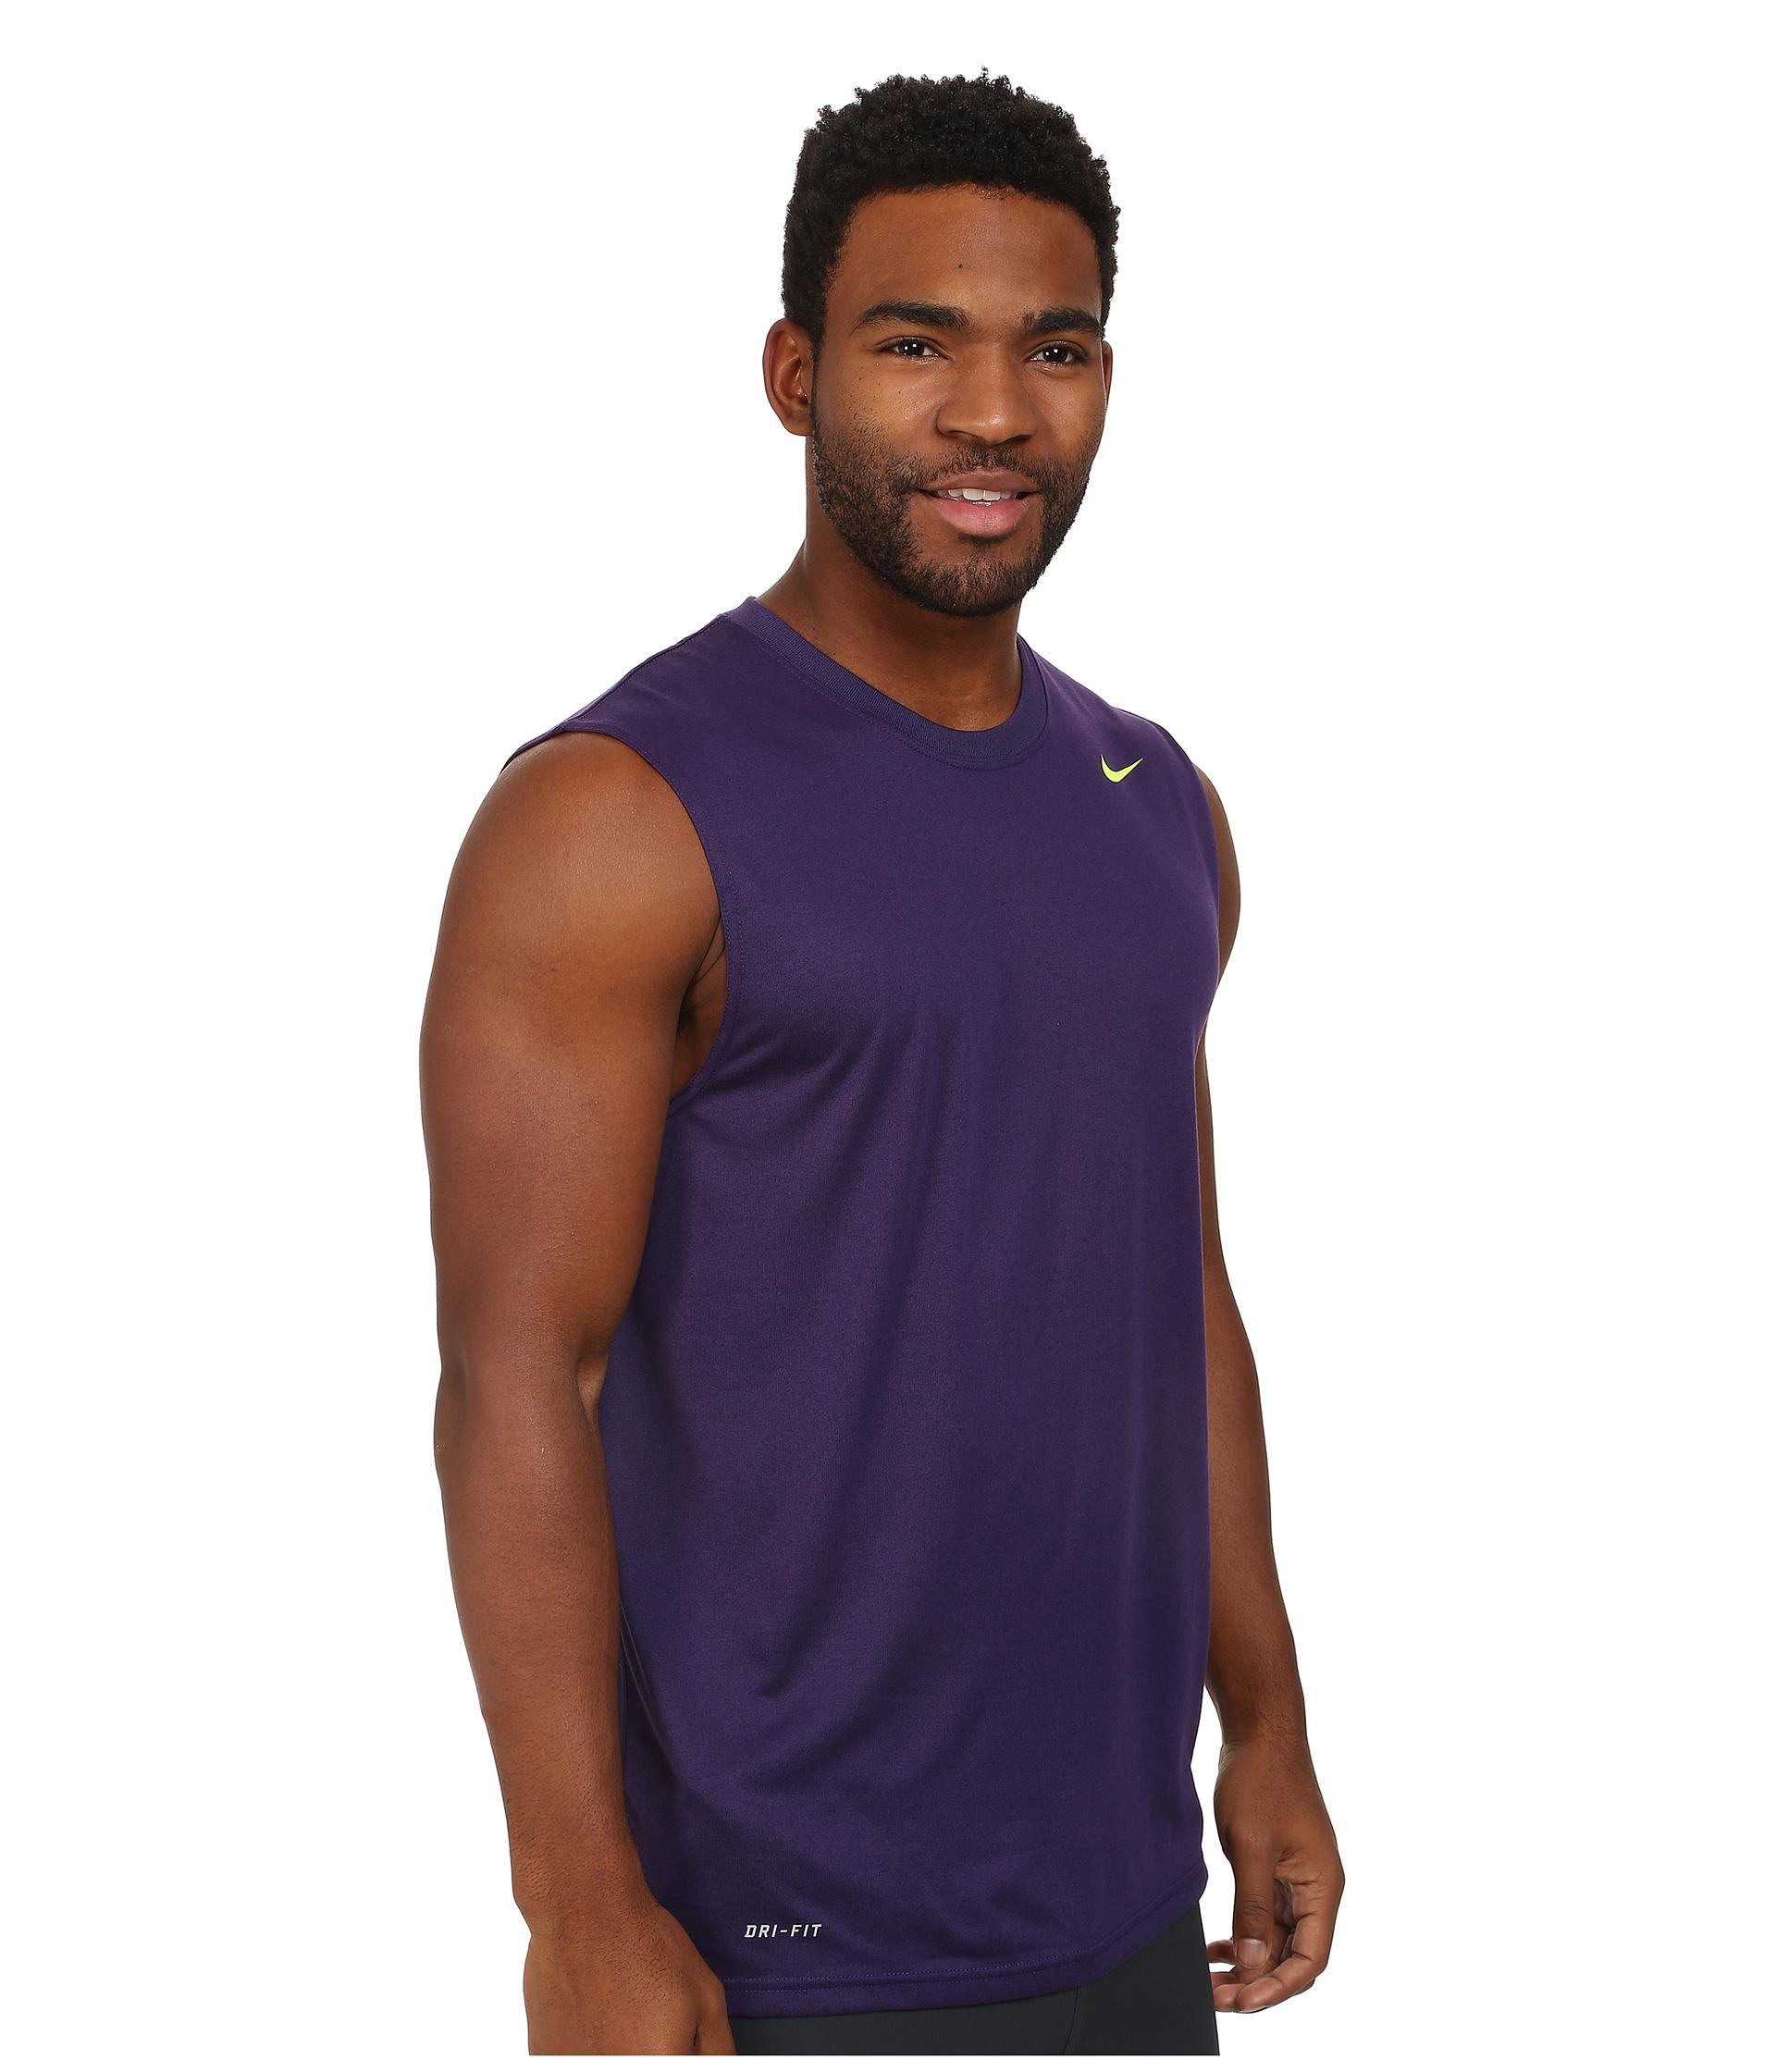 8bcda58e Nike Dri Fittm Legend Sleeveless Training Shirt - DREAMWORKS